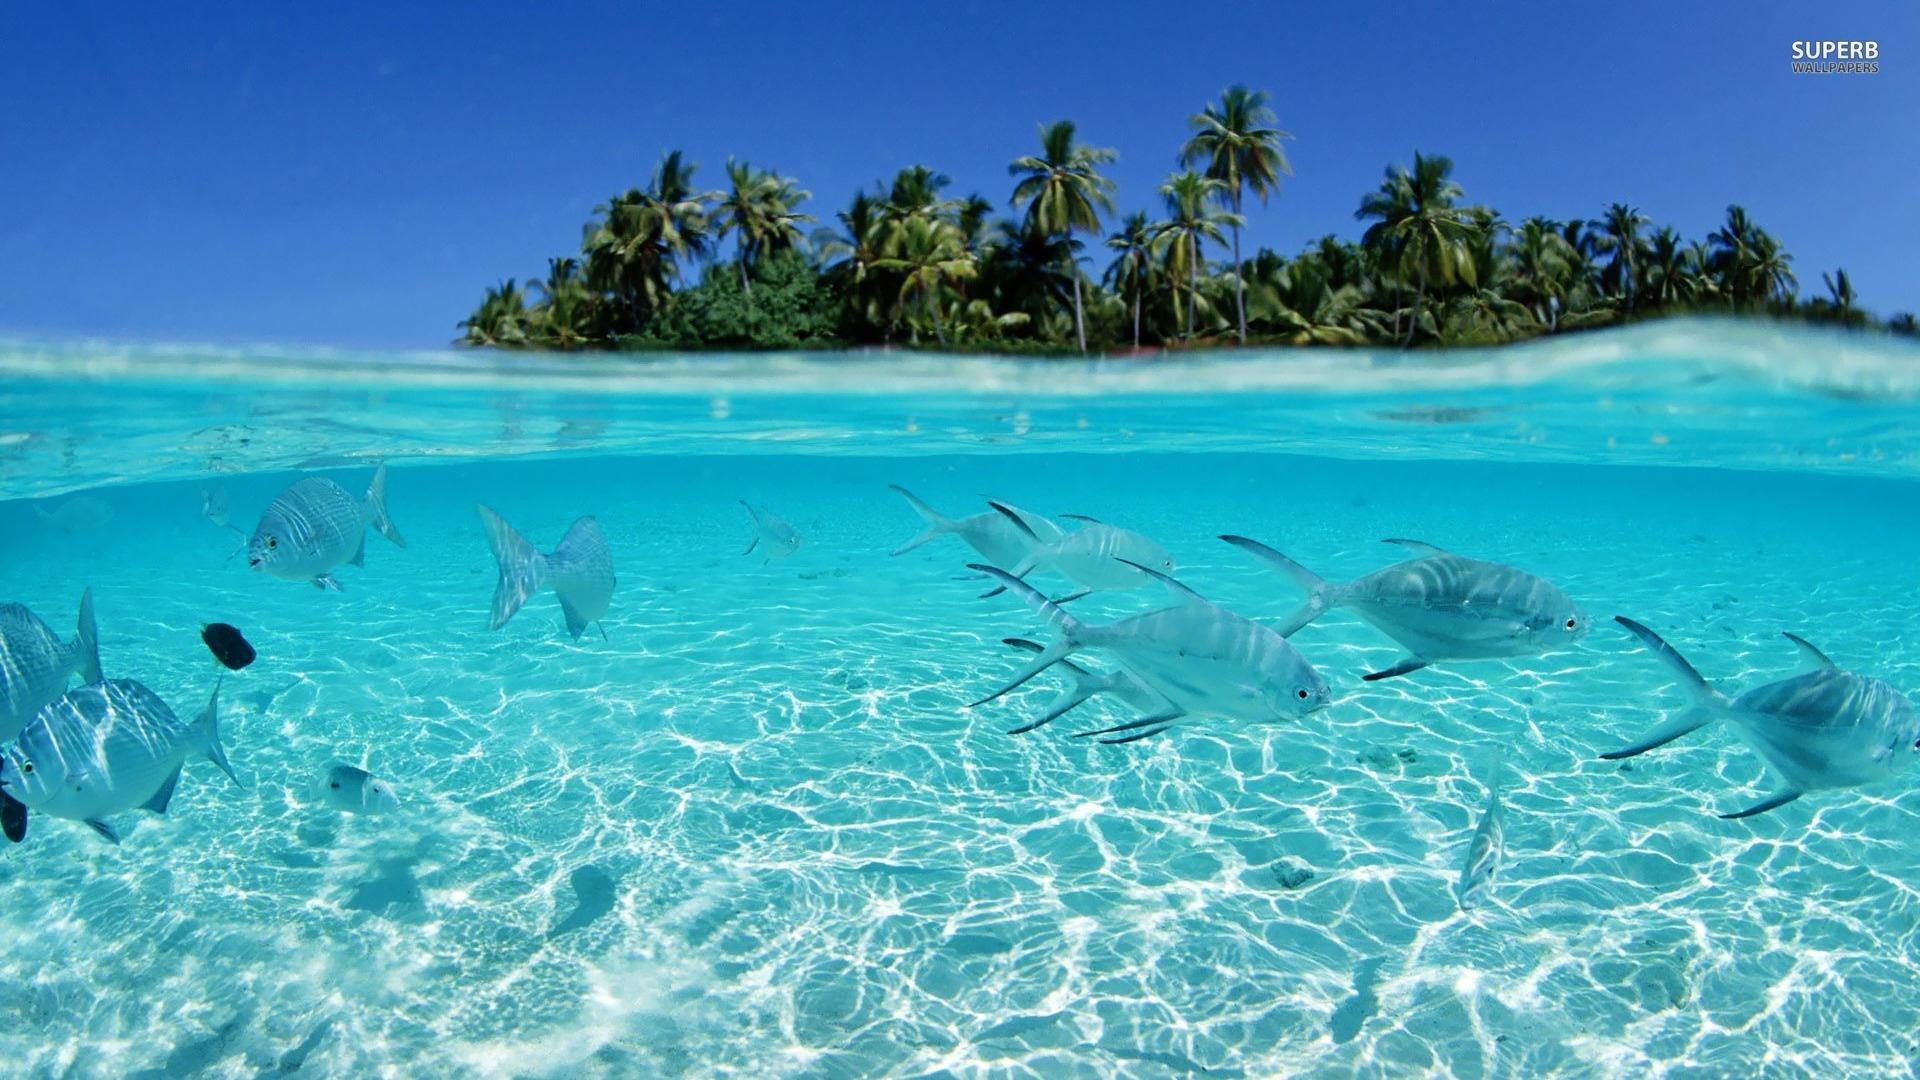 tropical fish wallpaper hd download tropical fish wallpaper - top